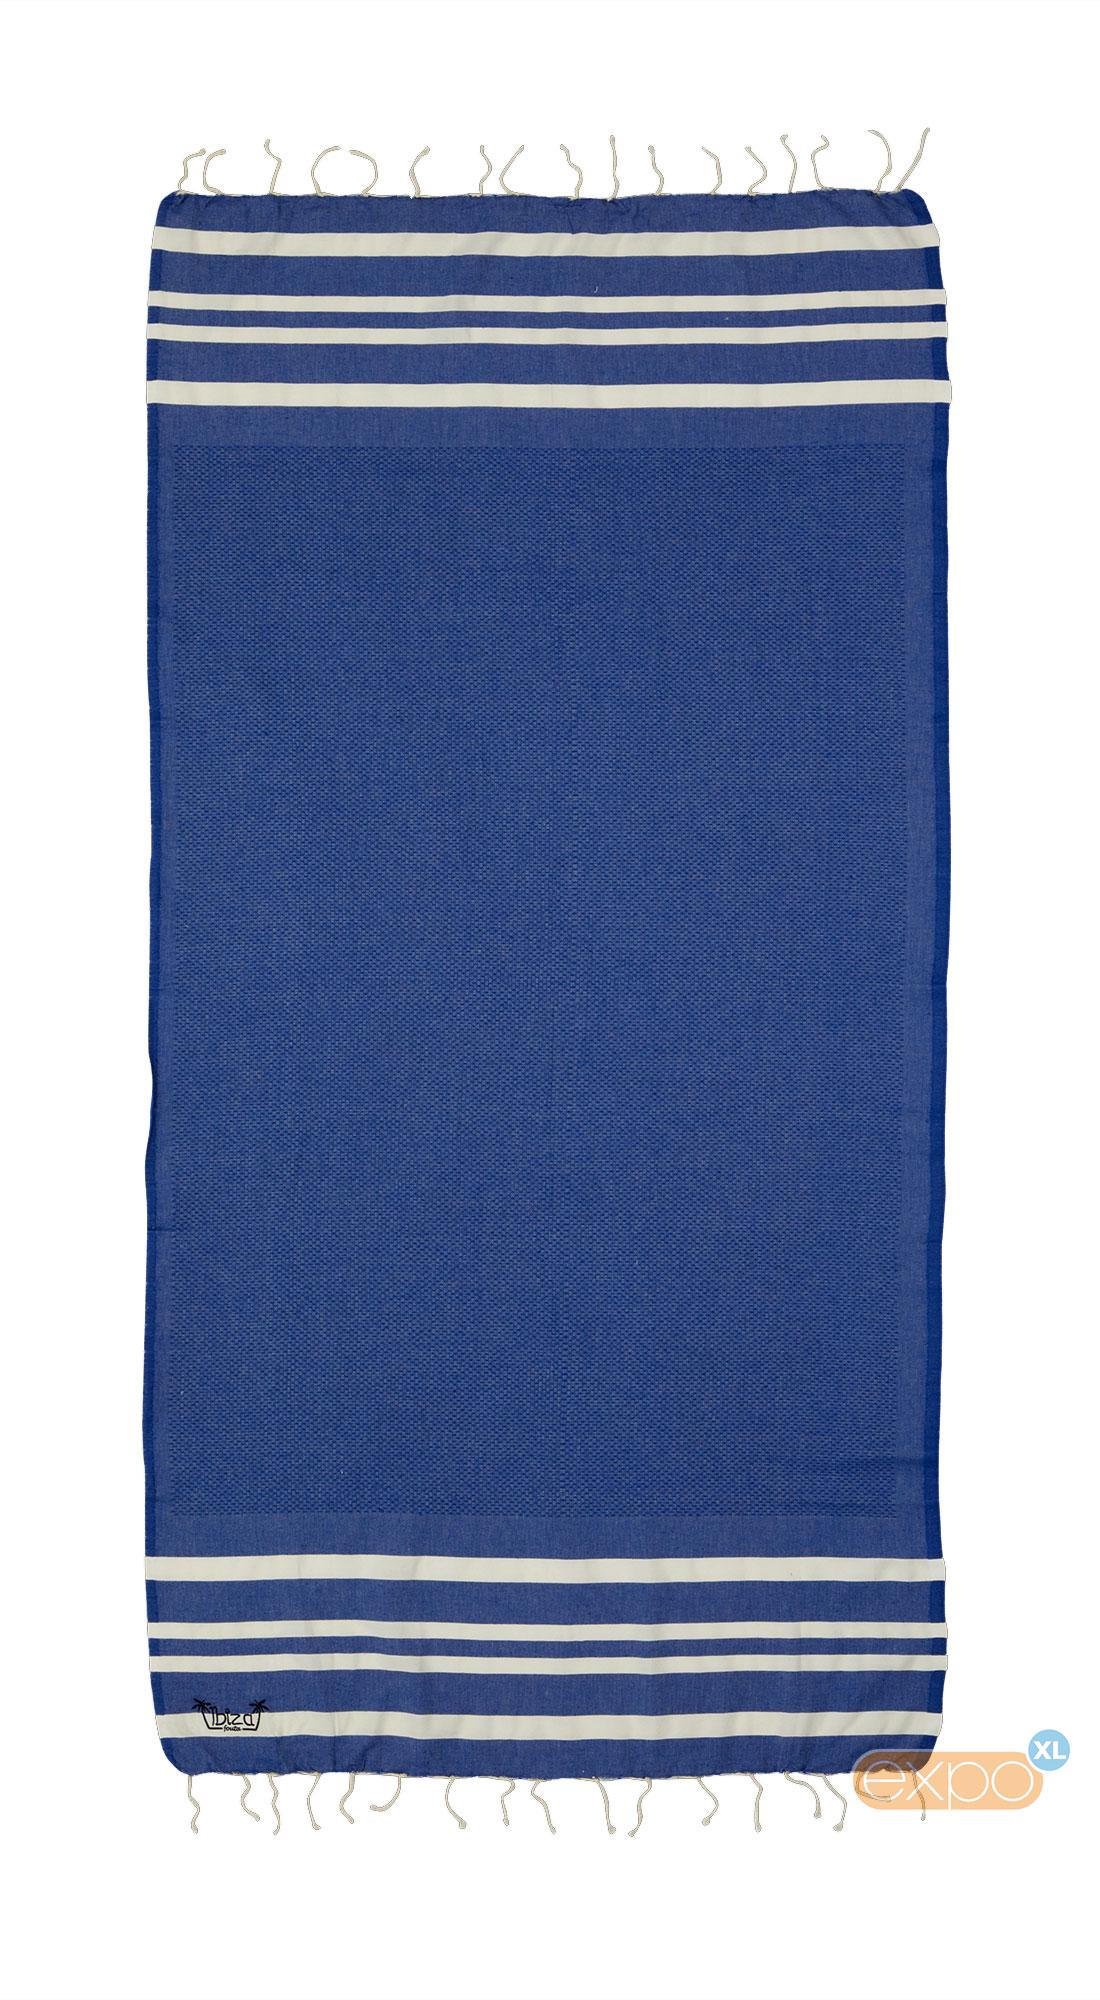 Expo XL Fouta Salines - XL hamamdoek - blauw